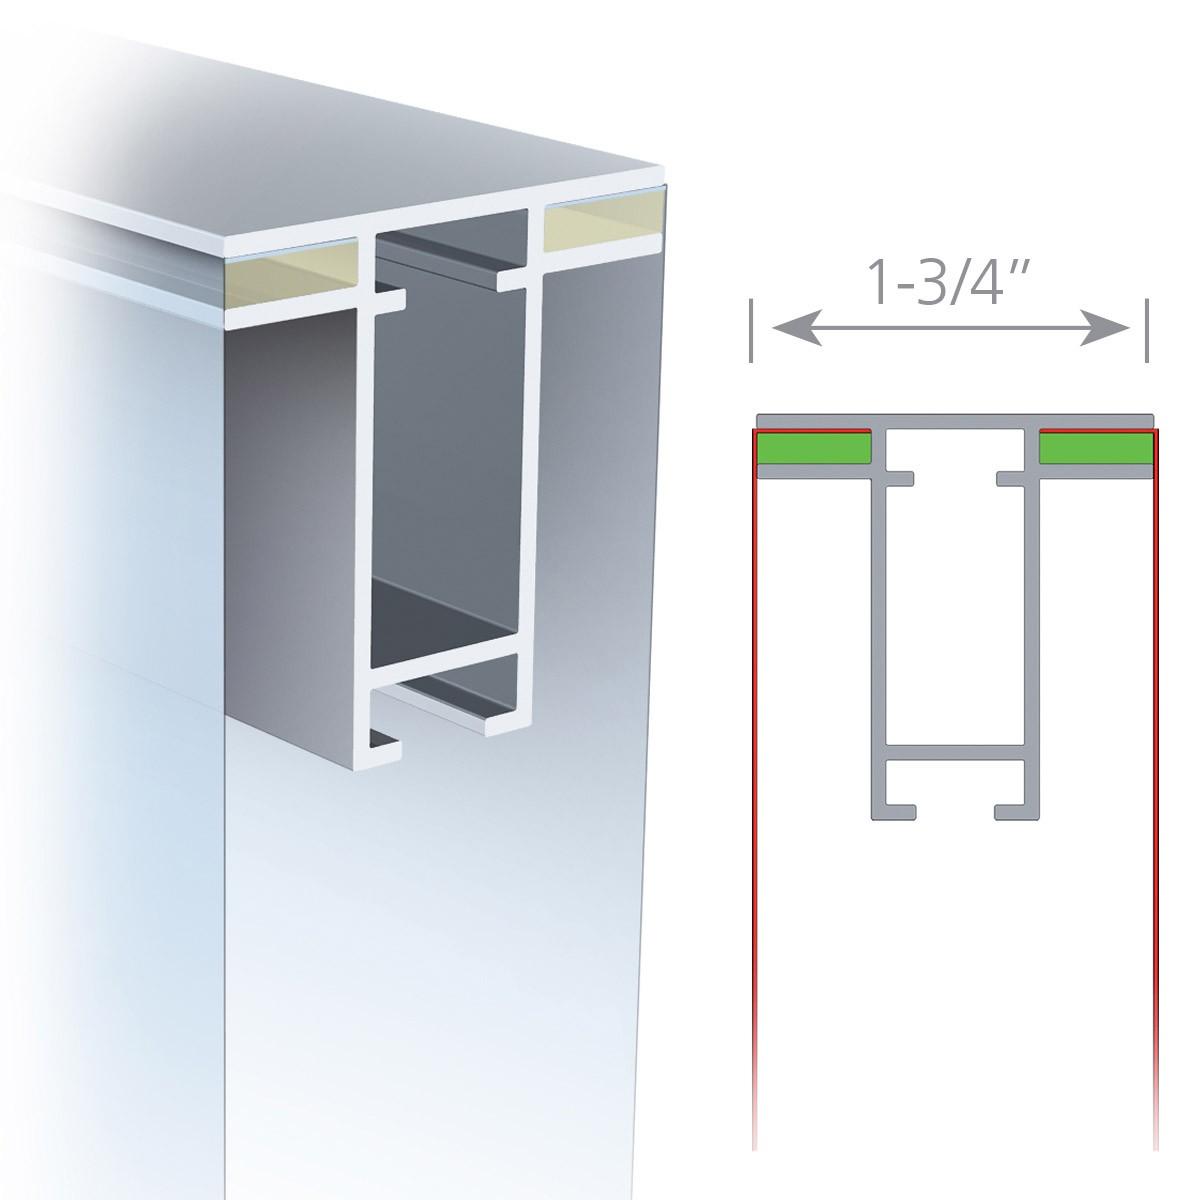 Charisma 24x48 Double Sided SEG Fabric Frame